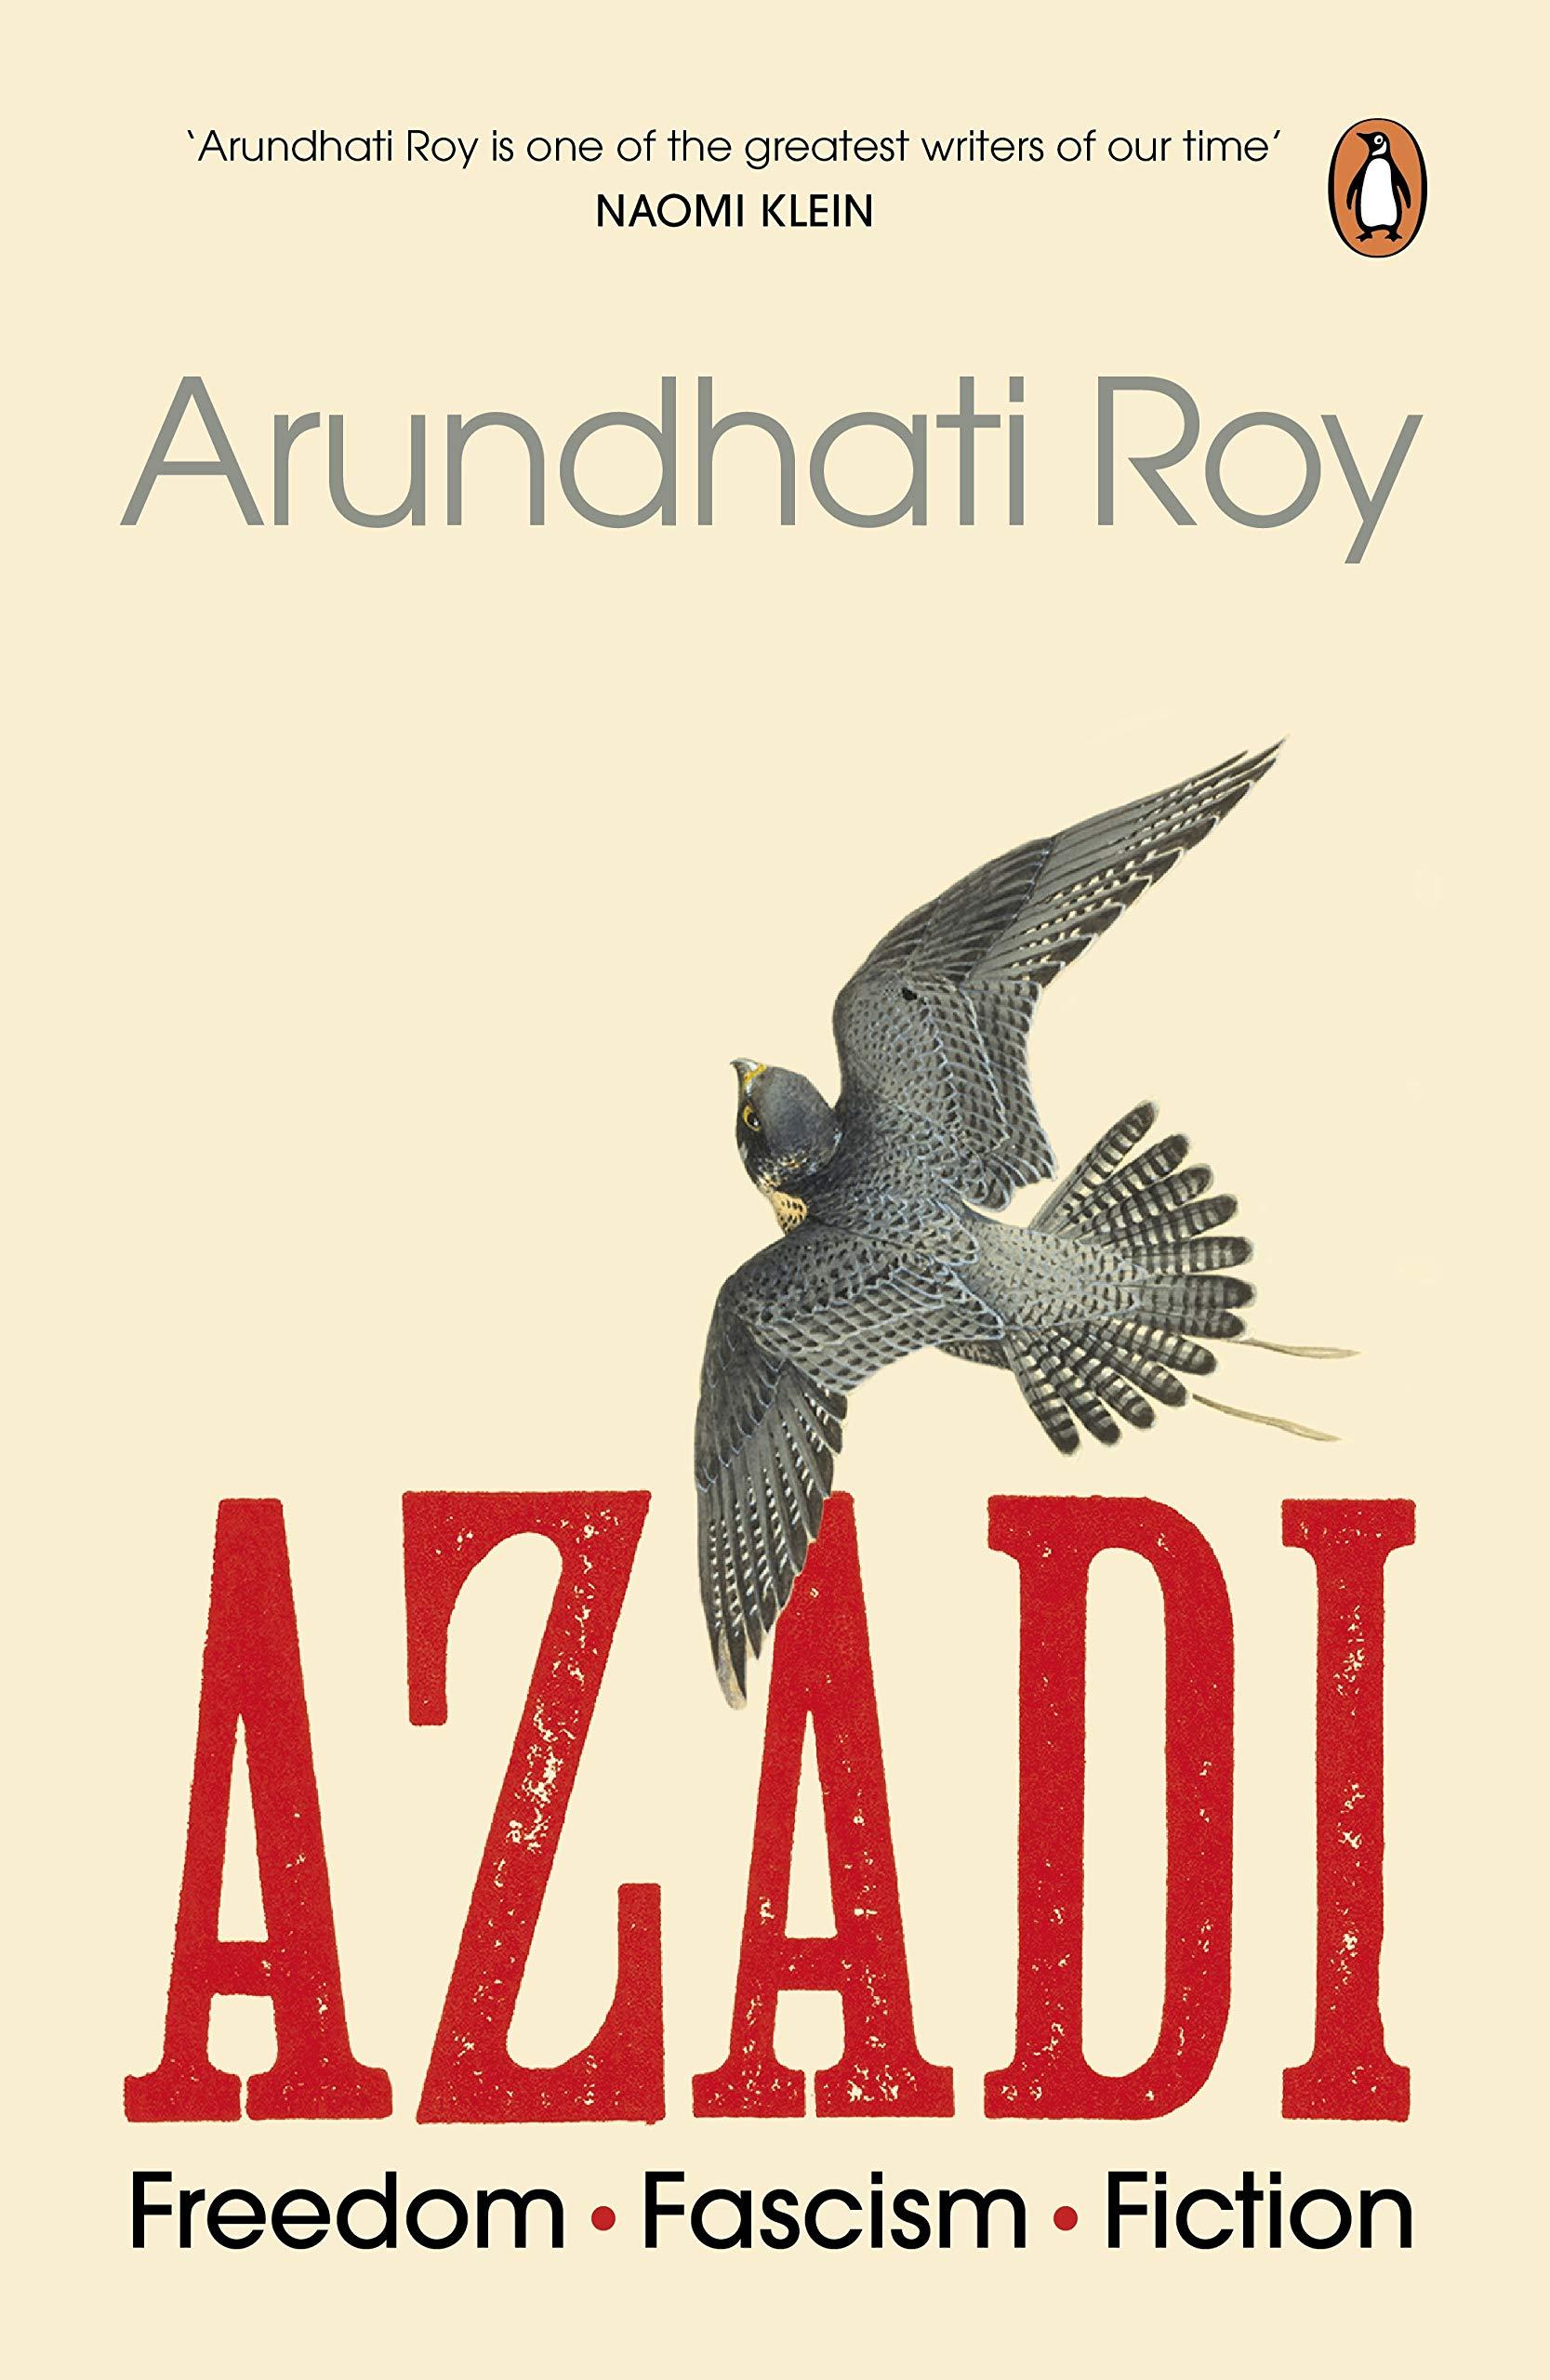 Azadi: Freedom, Fascism, Fiction by Arundhati Roy, Penguin, Rs 499